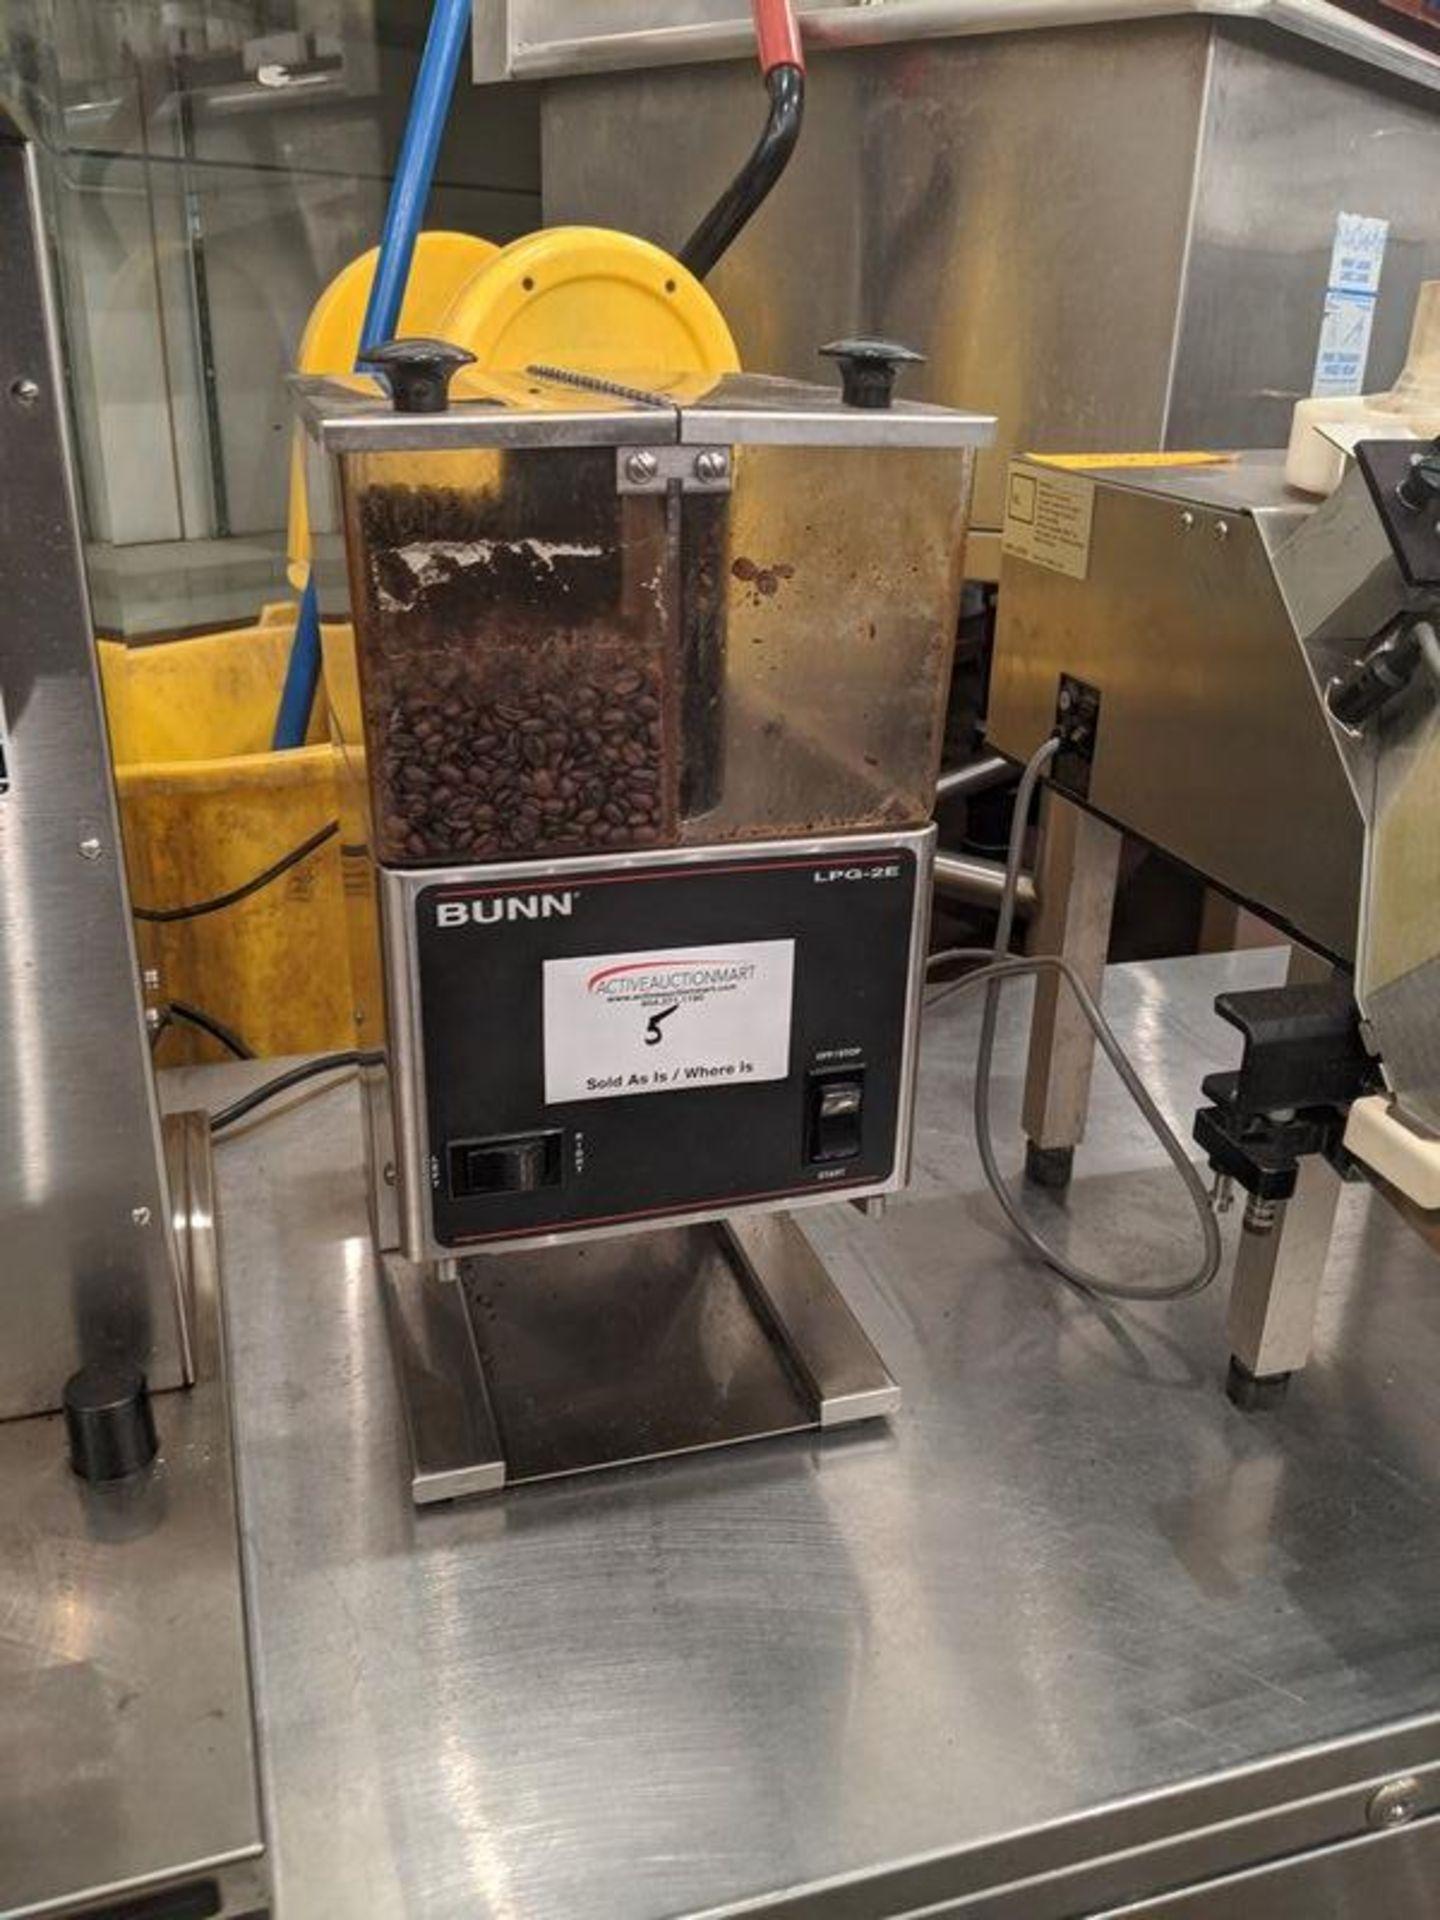 Lot 5 - Bunn Dual Hopper Coffee Grinder